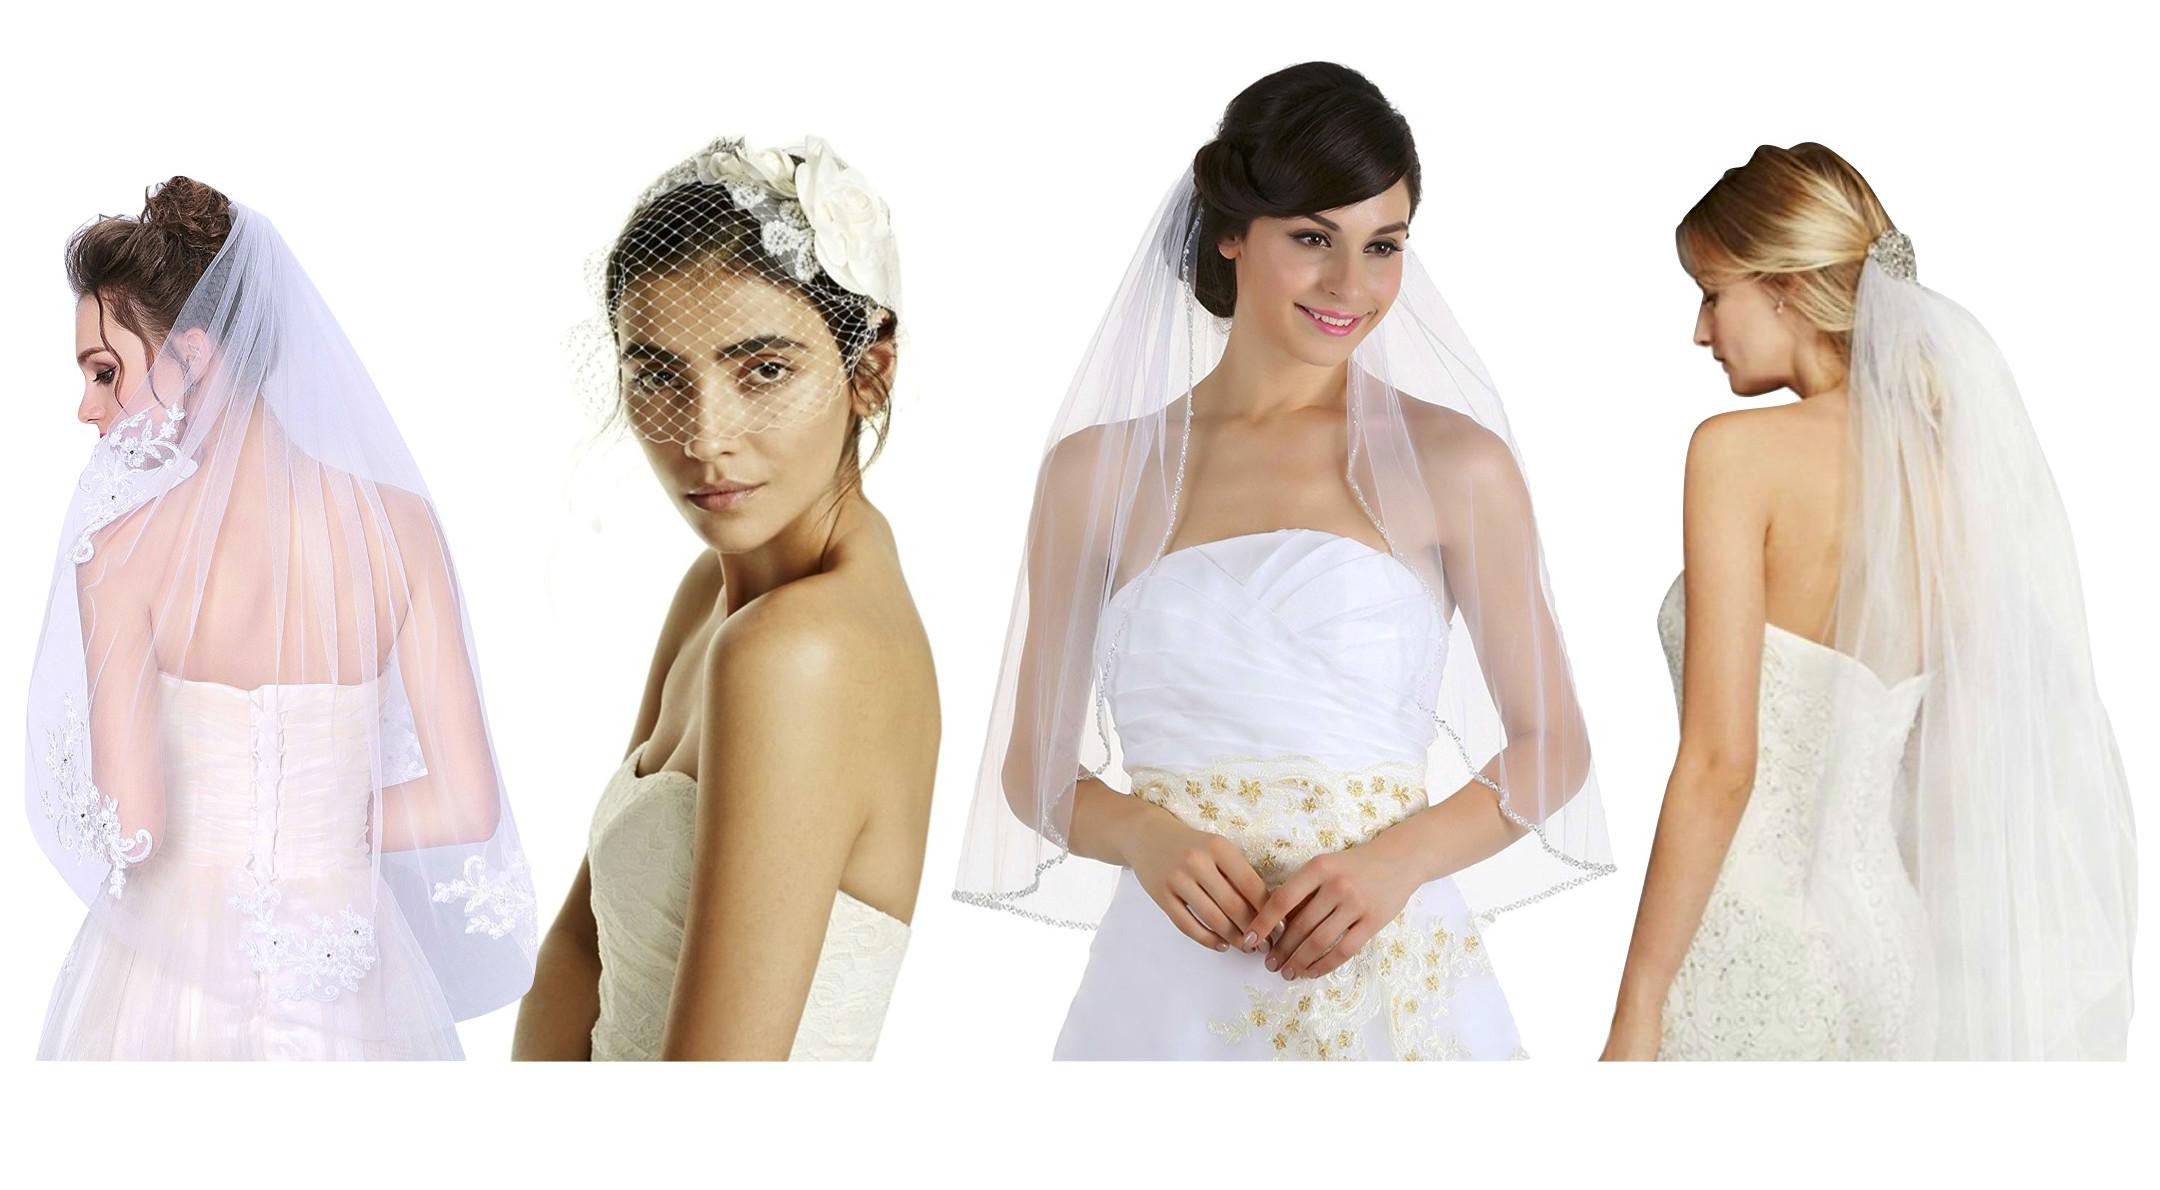 bridal veils, veil, bridal headpieces, bridal hair accessories